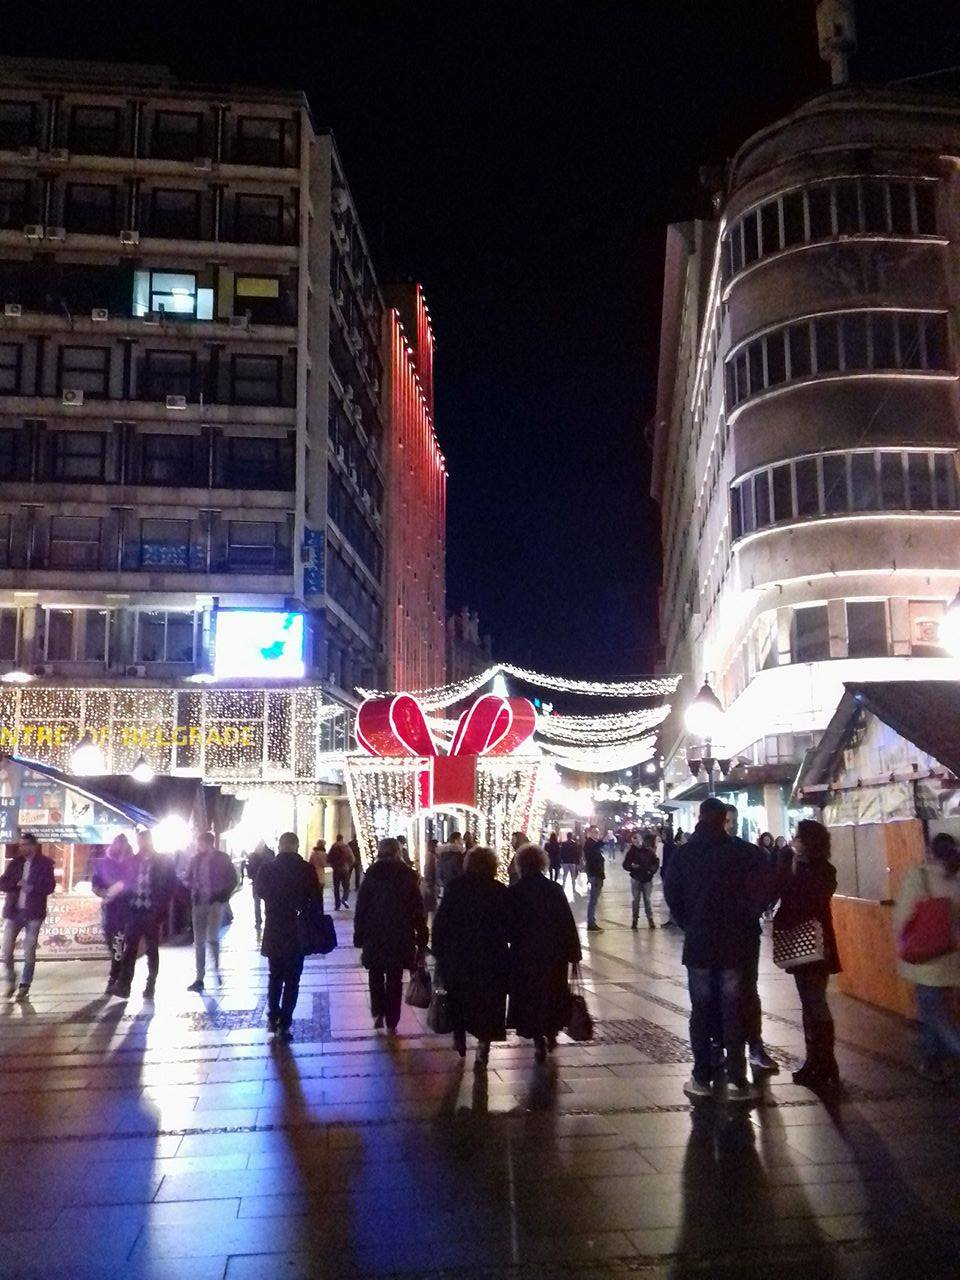 Новогодишња расвета у Београду Фото:Београдске.рс